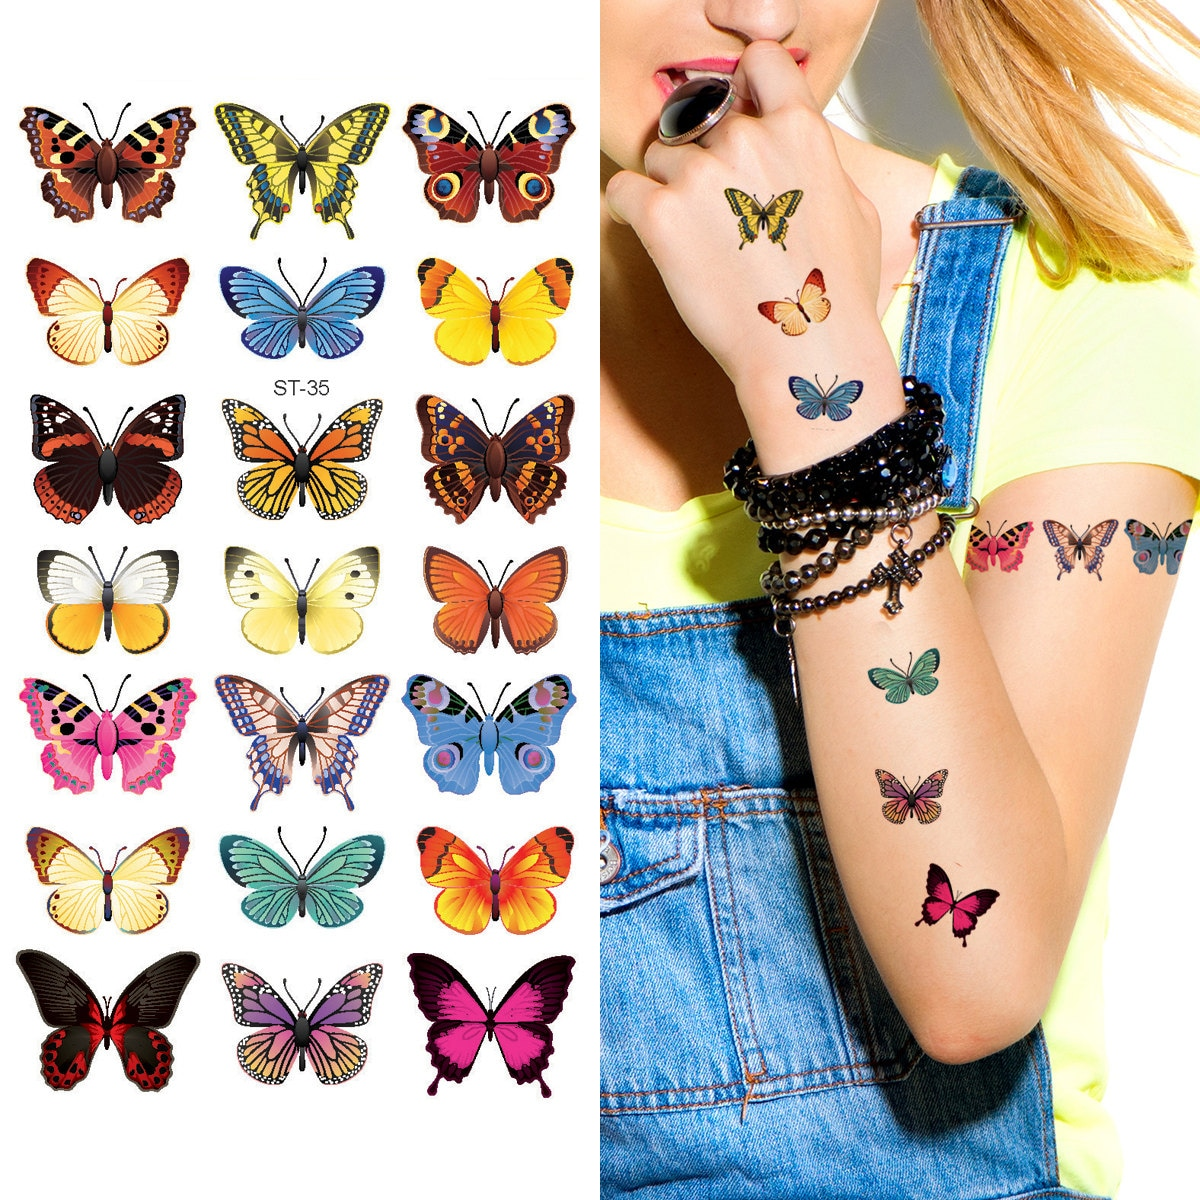 supperb tempor re tattoos 21 kleine schmetterlinge tattoo. Black Bedroom Furniture Sets. Home Design Ideas